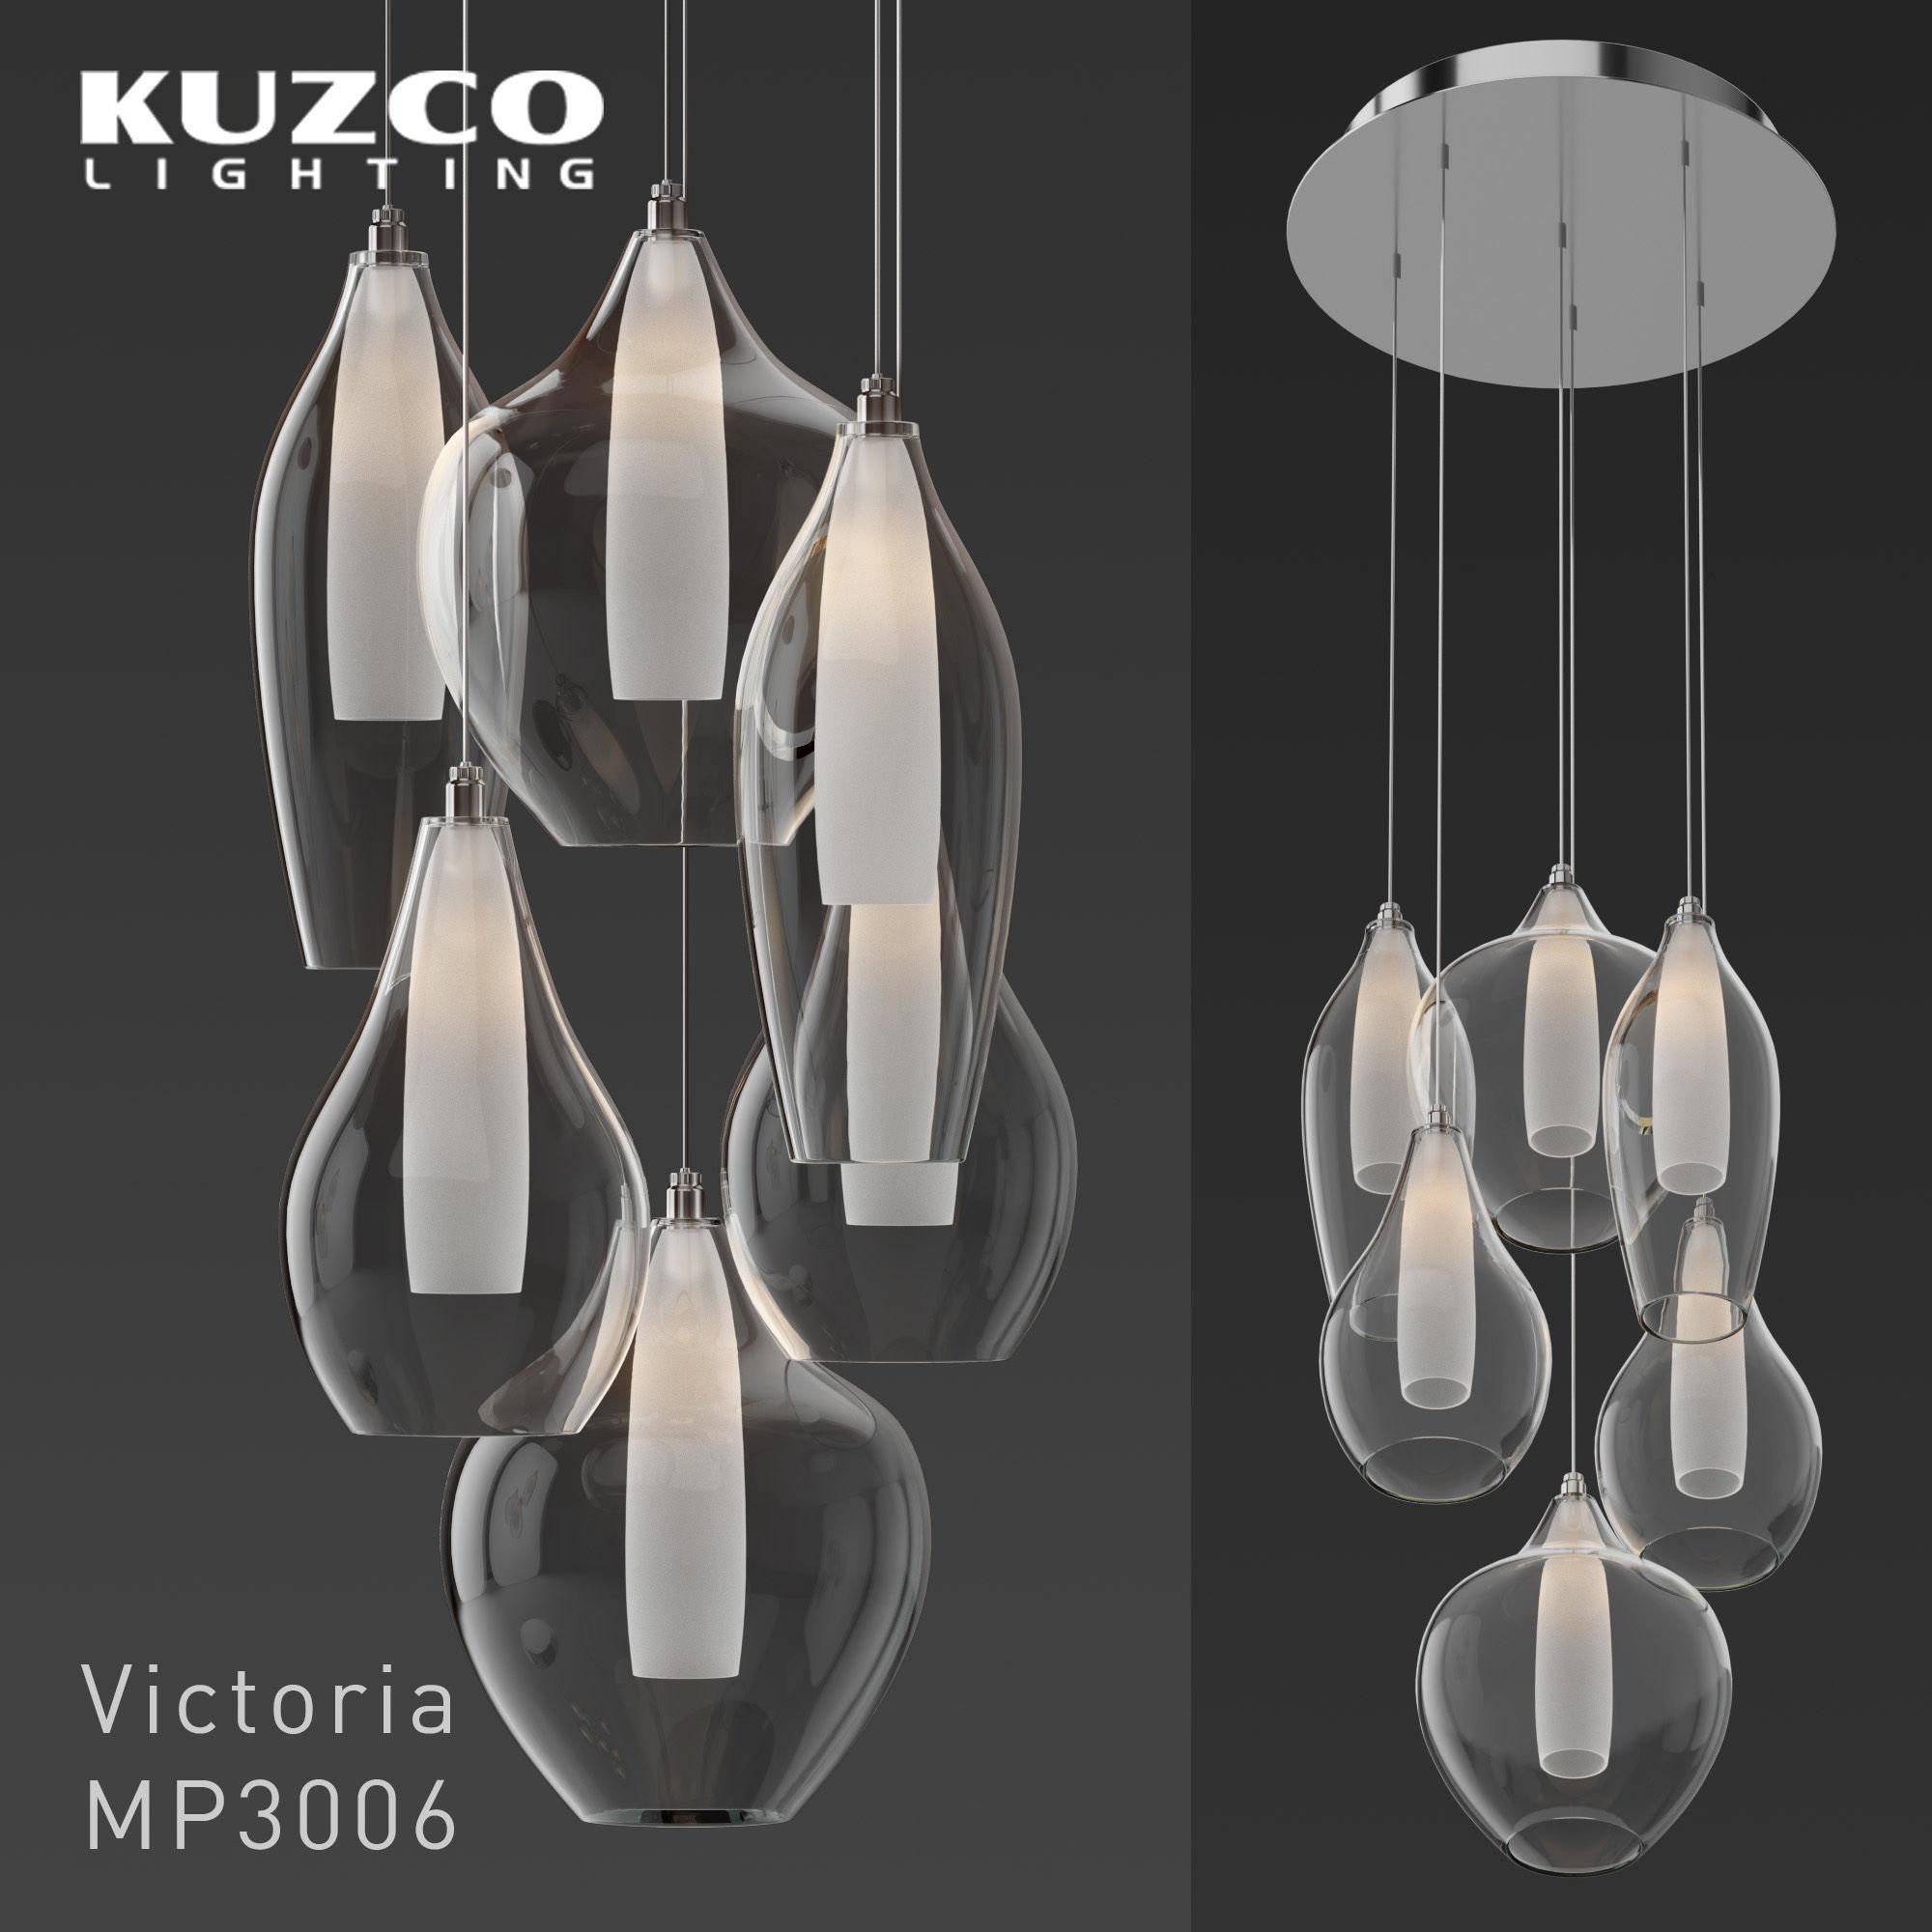 Kuzco Lighting Victoria Mp3006 Pendant Light Model